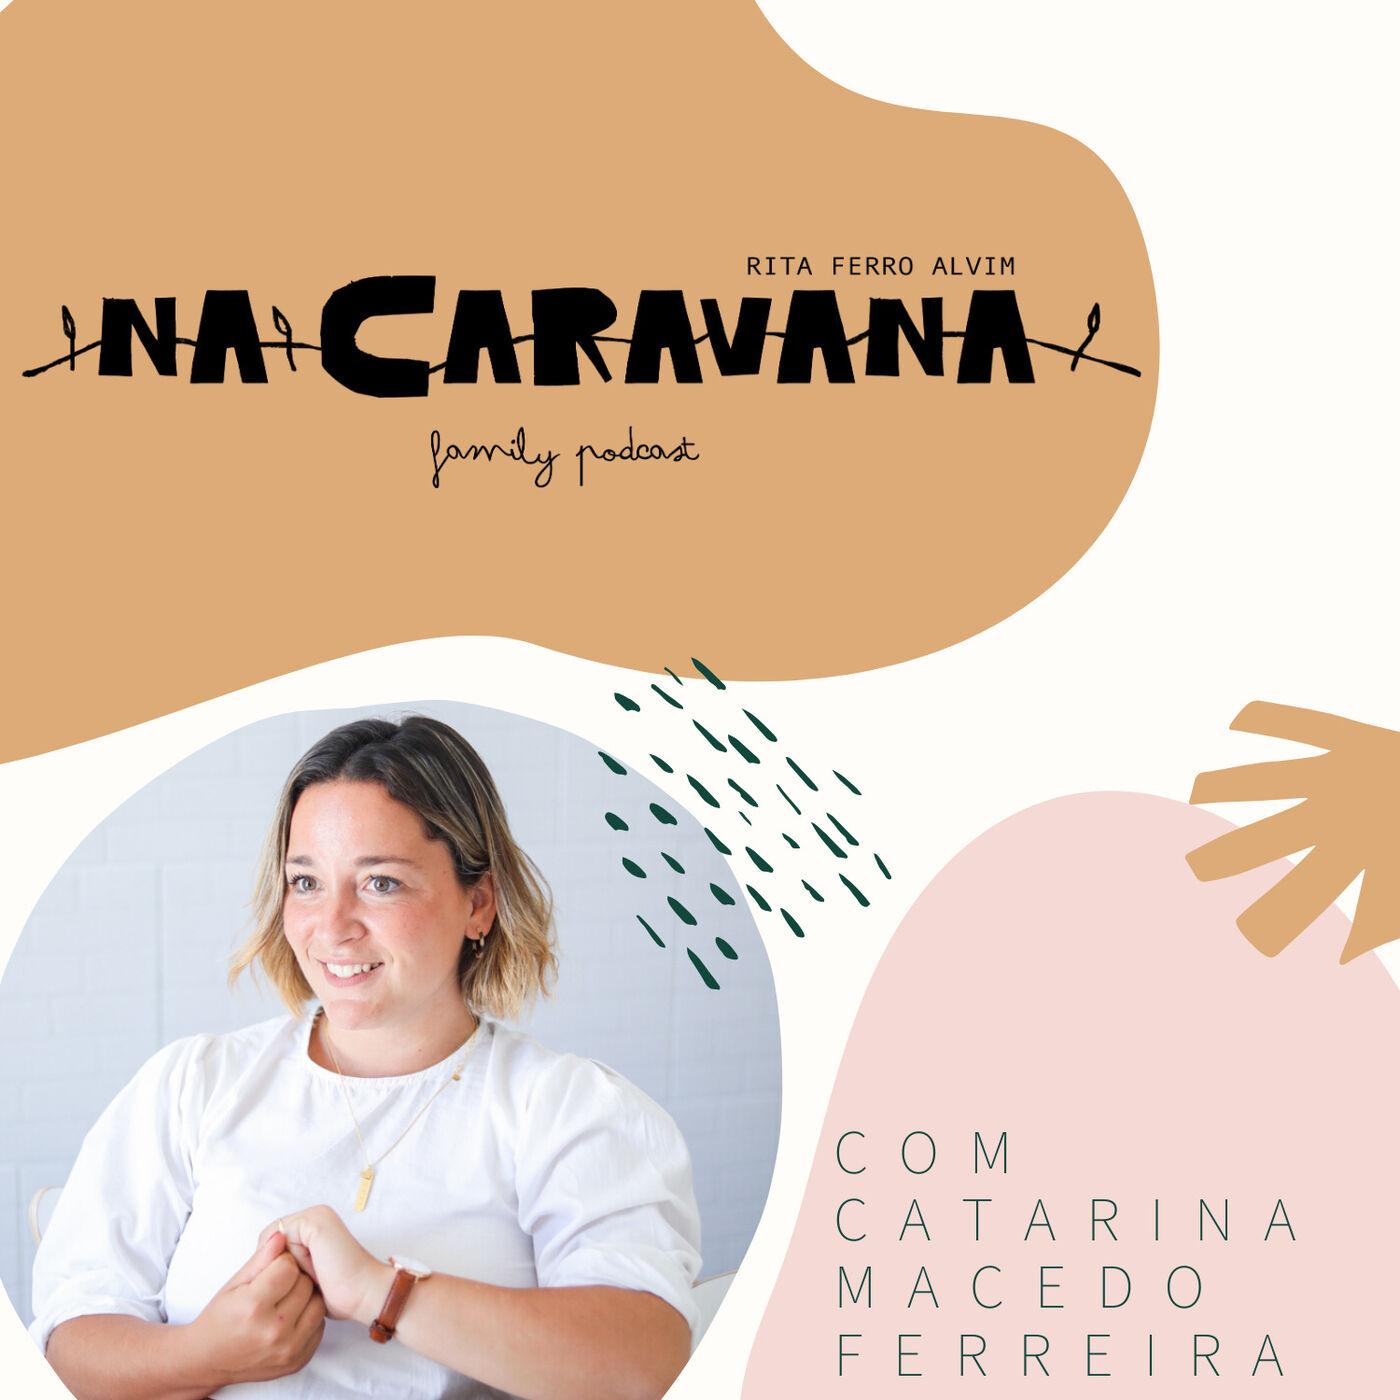 N'A Caravana com Catarina Macedo Ferreira #22 Mãe aos 22, casar sem preconceito e diástase